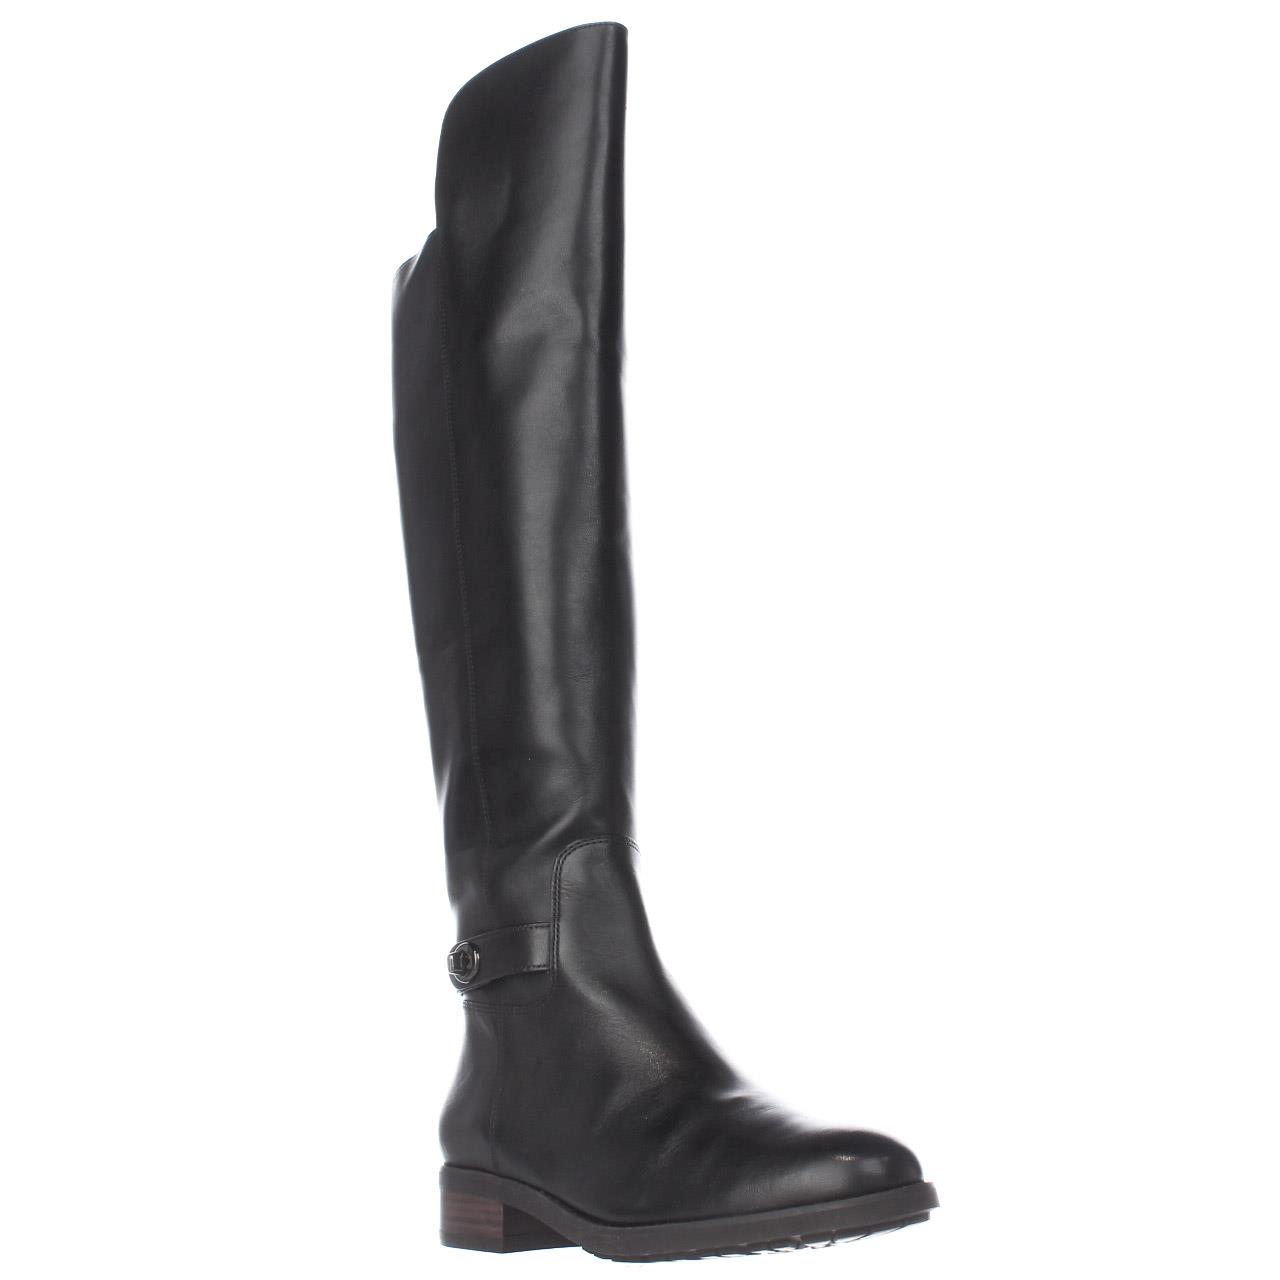 Womens Coach Emmie Tall Turnlock Boots, Black